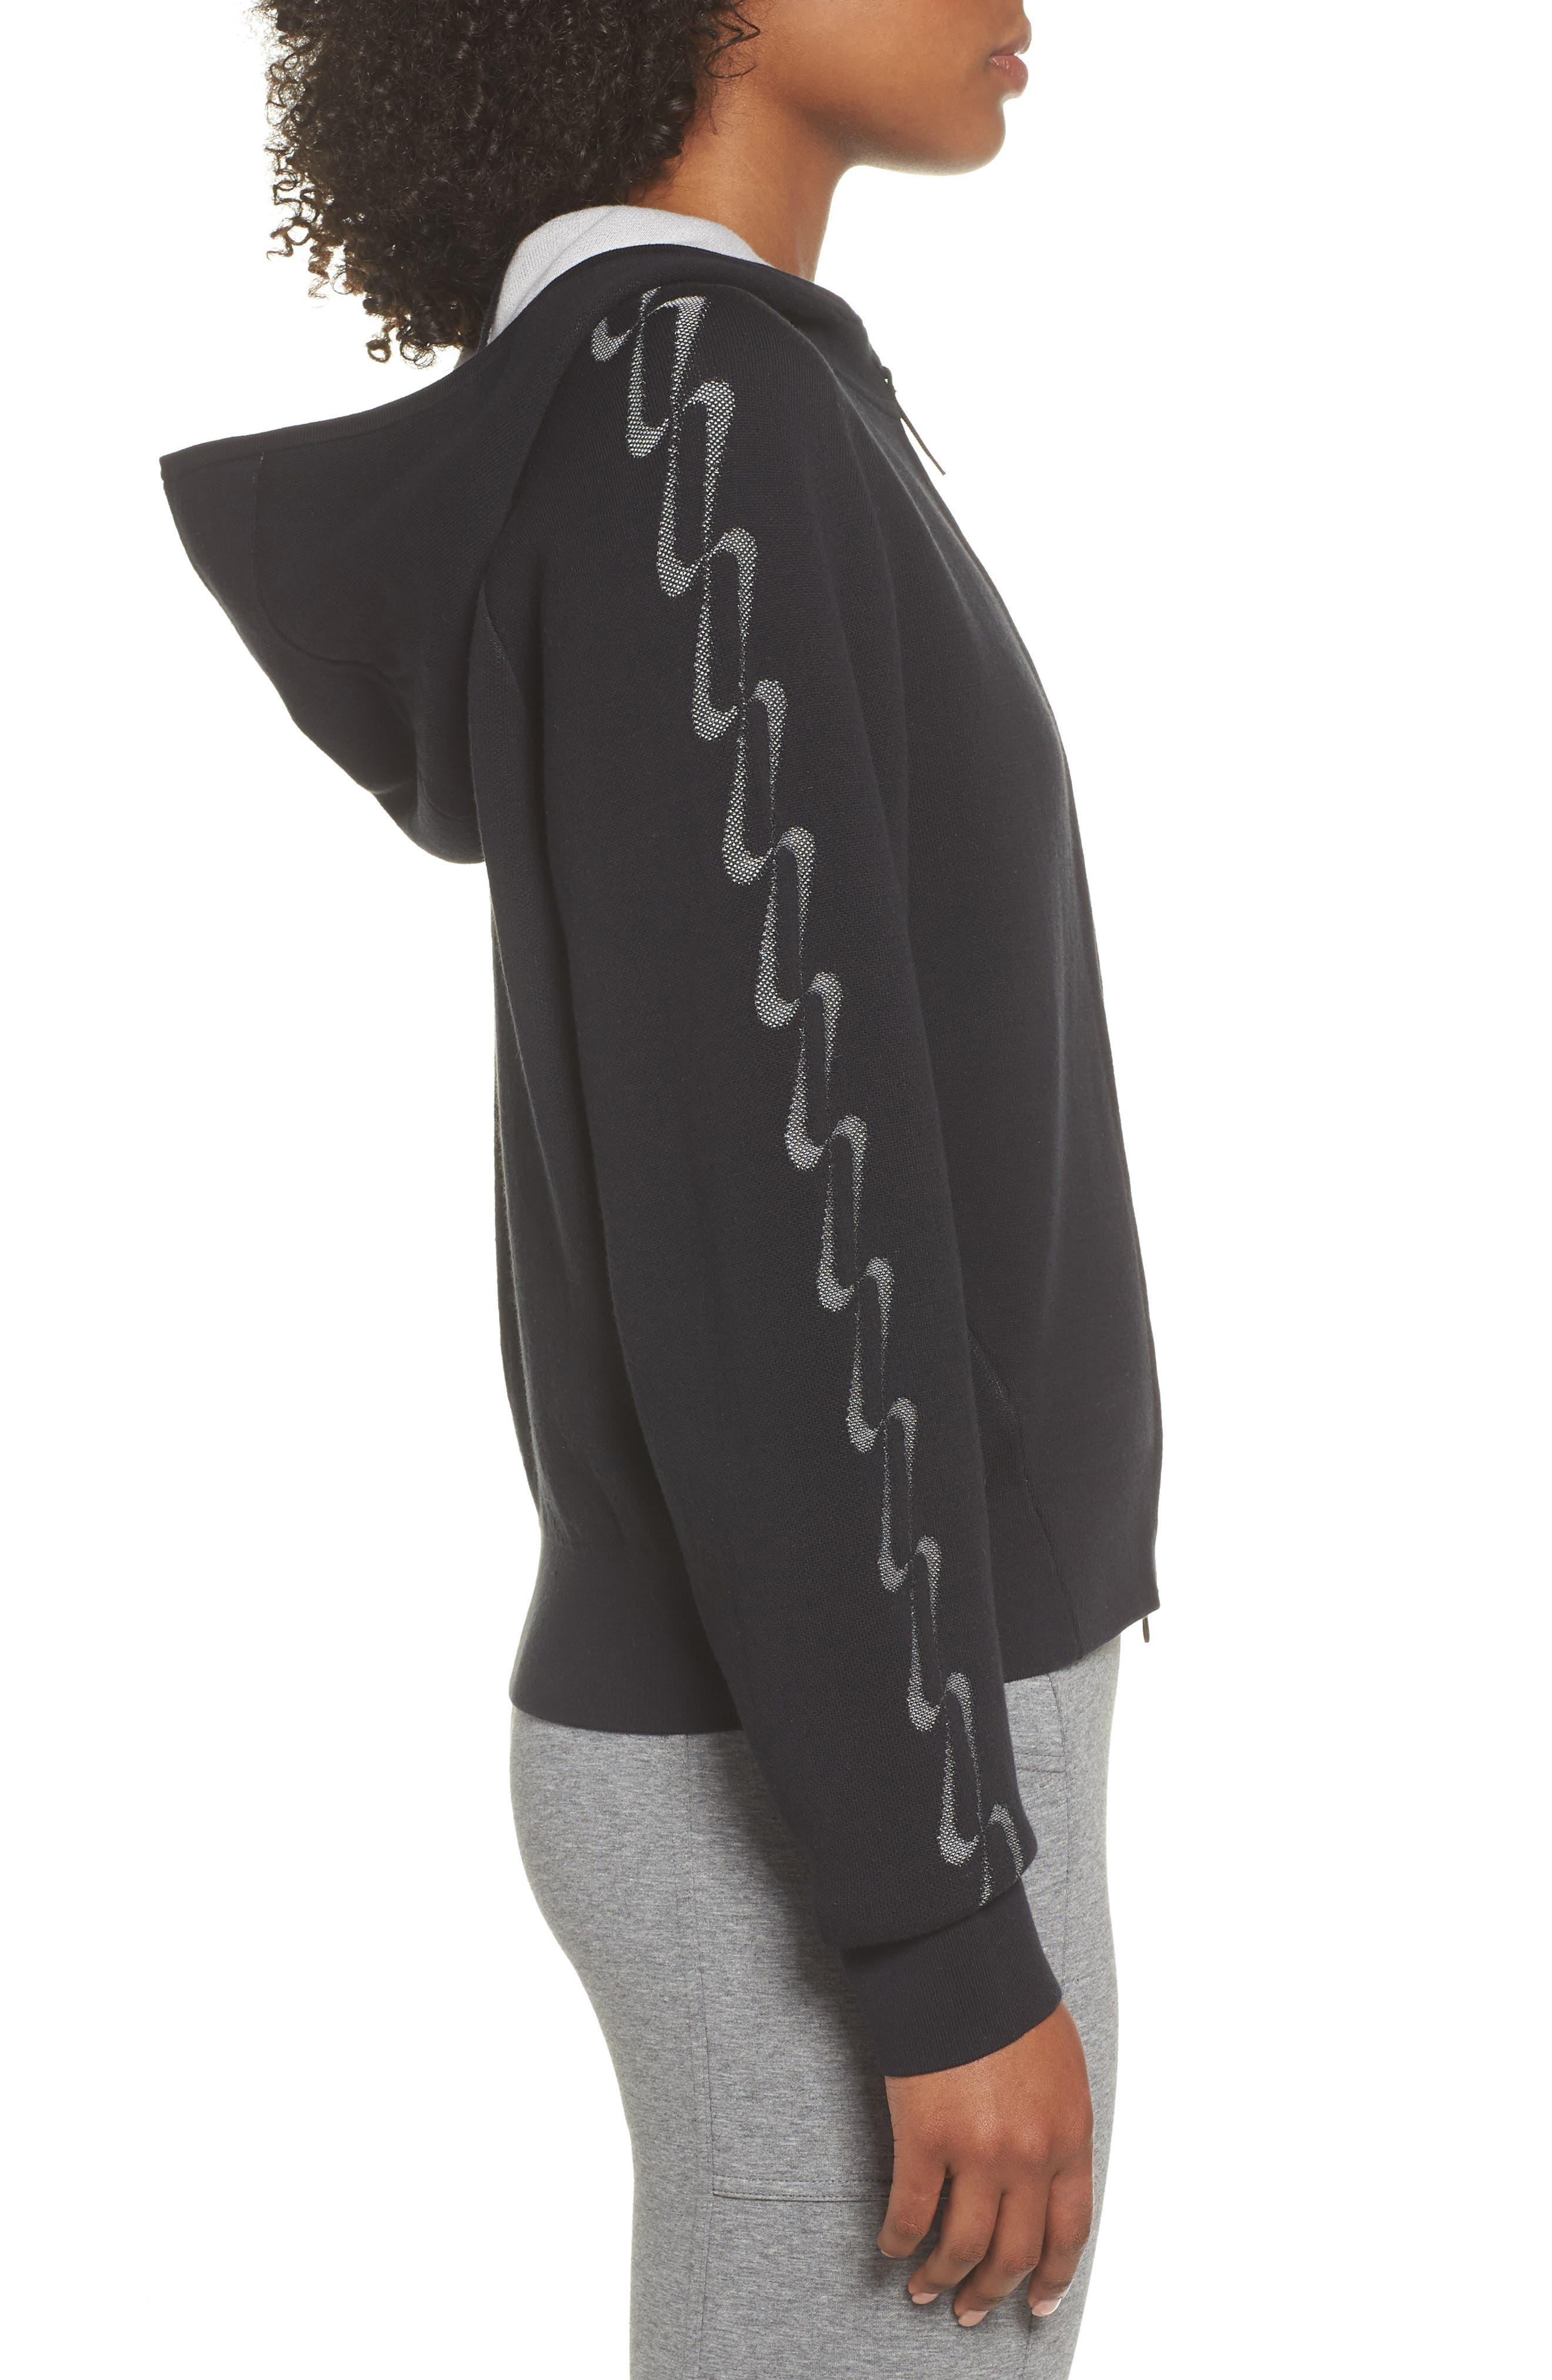 NRG Women's Knit Jacket,                             Alternate thumbnail 3, color,                             Black/ Vast Grey